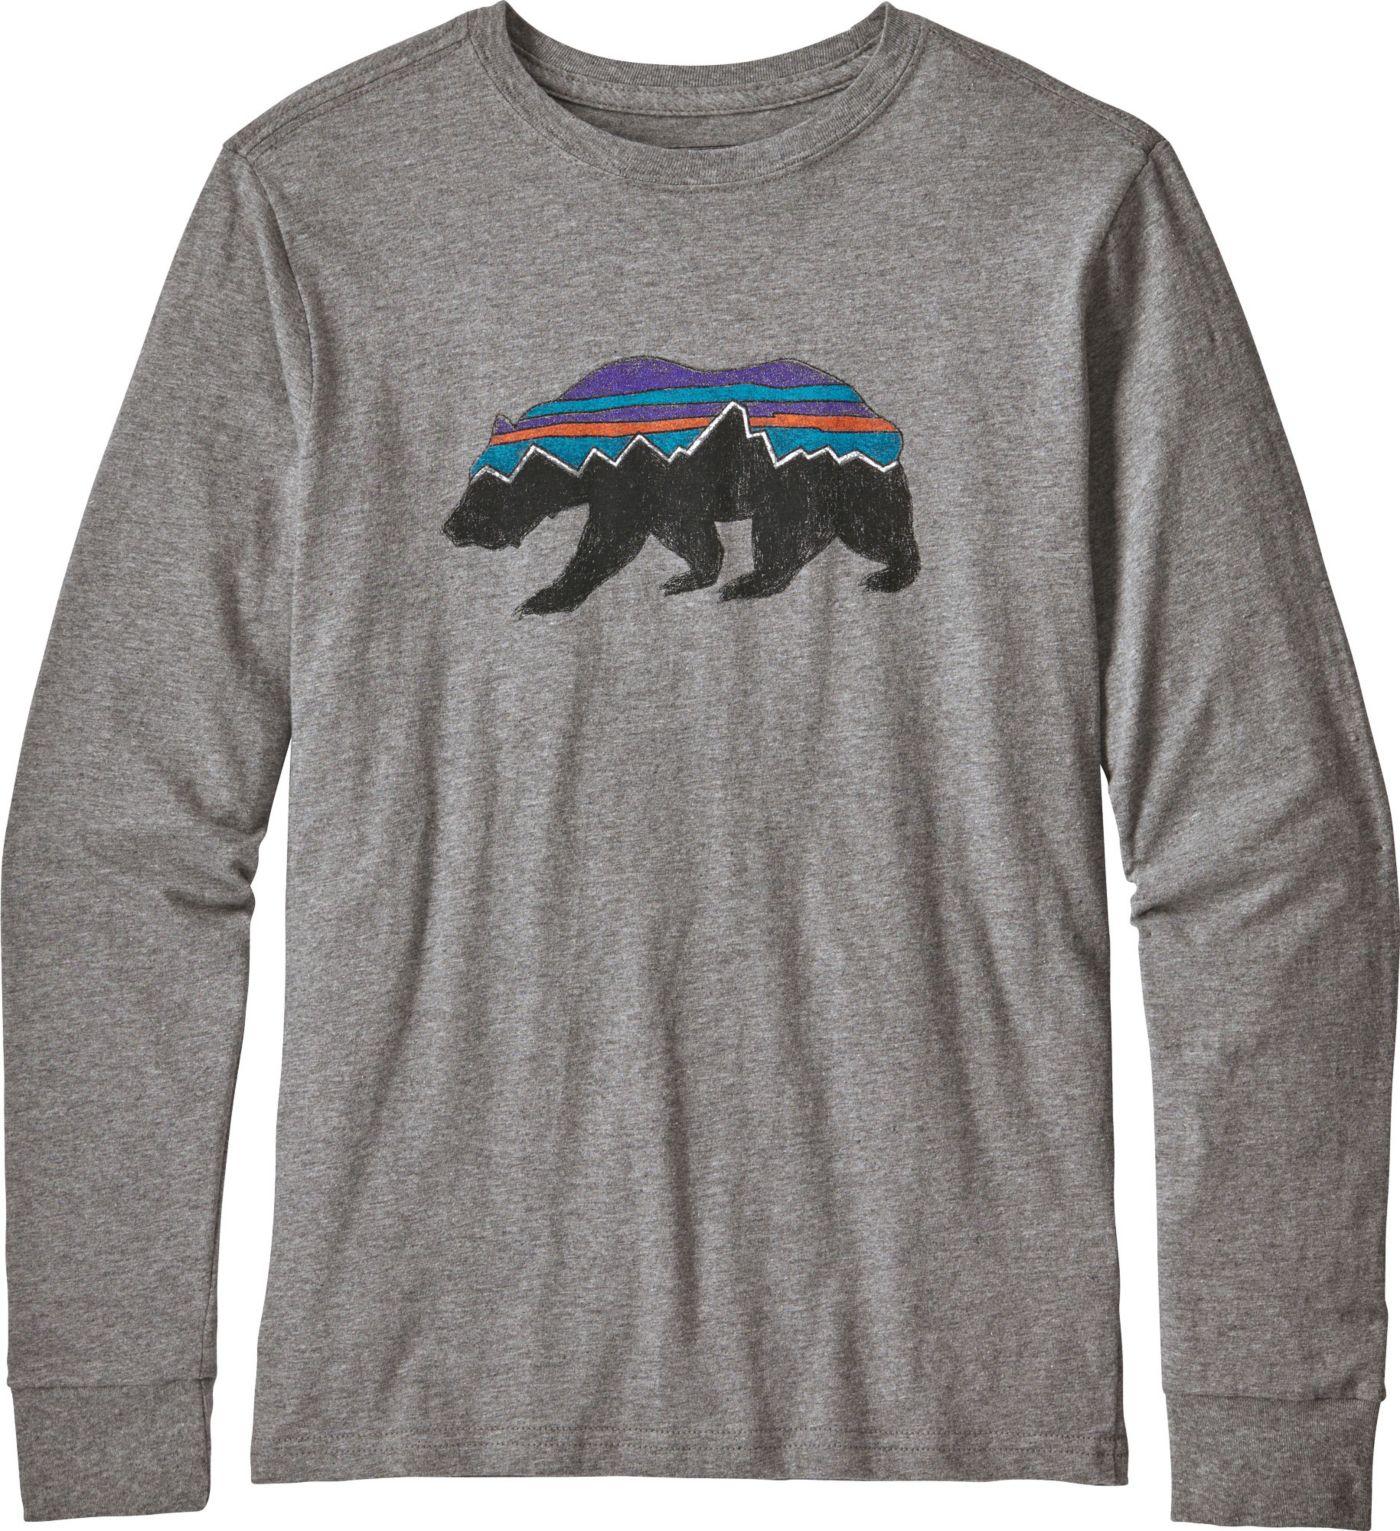 Patagonia Boys' Graphic Organic Long Sleeve Shirt